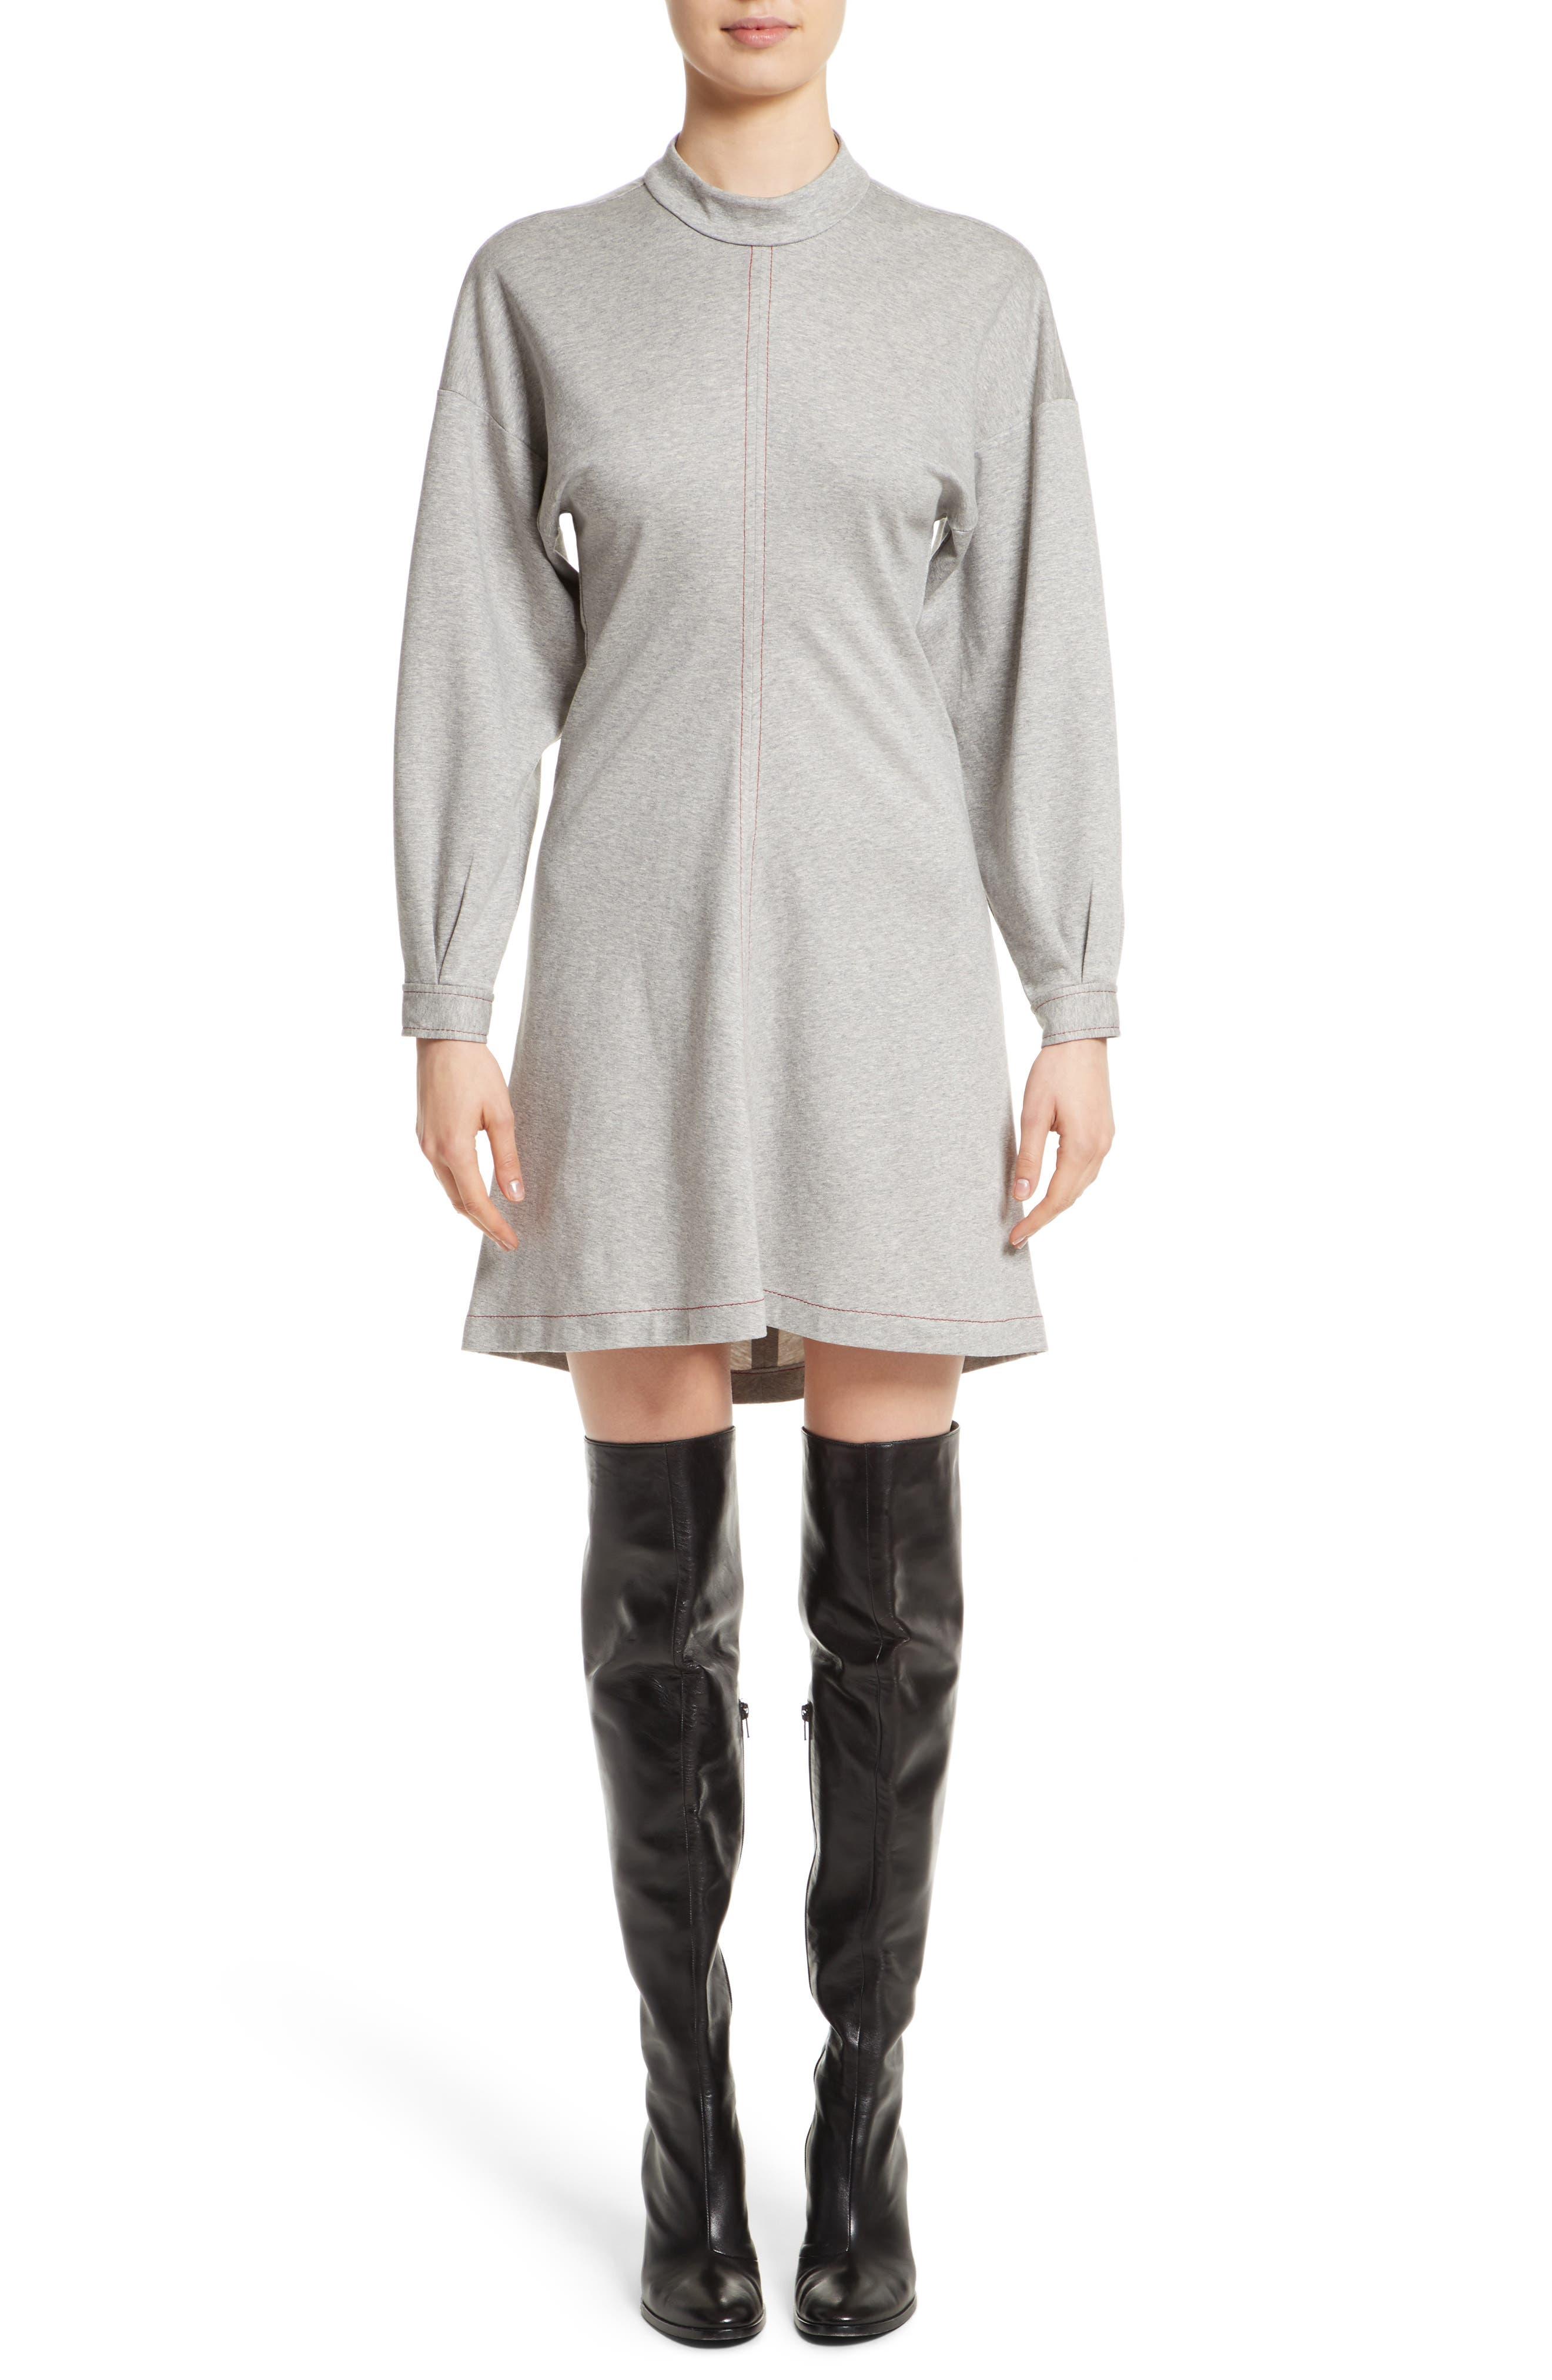 Colovos Mock Neck Sweatshirt Dress